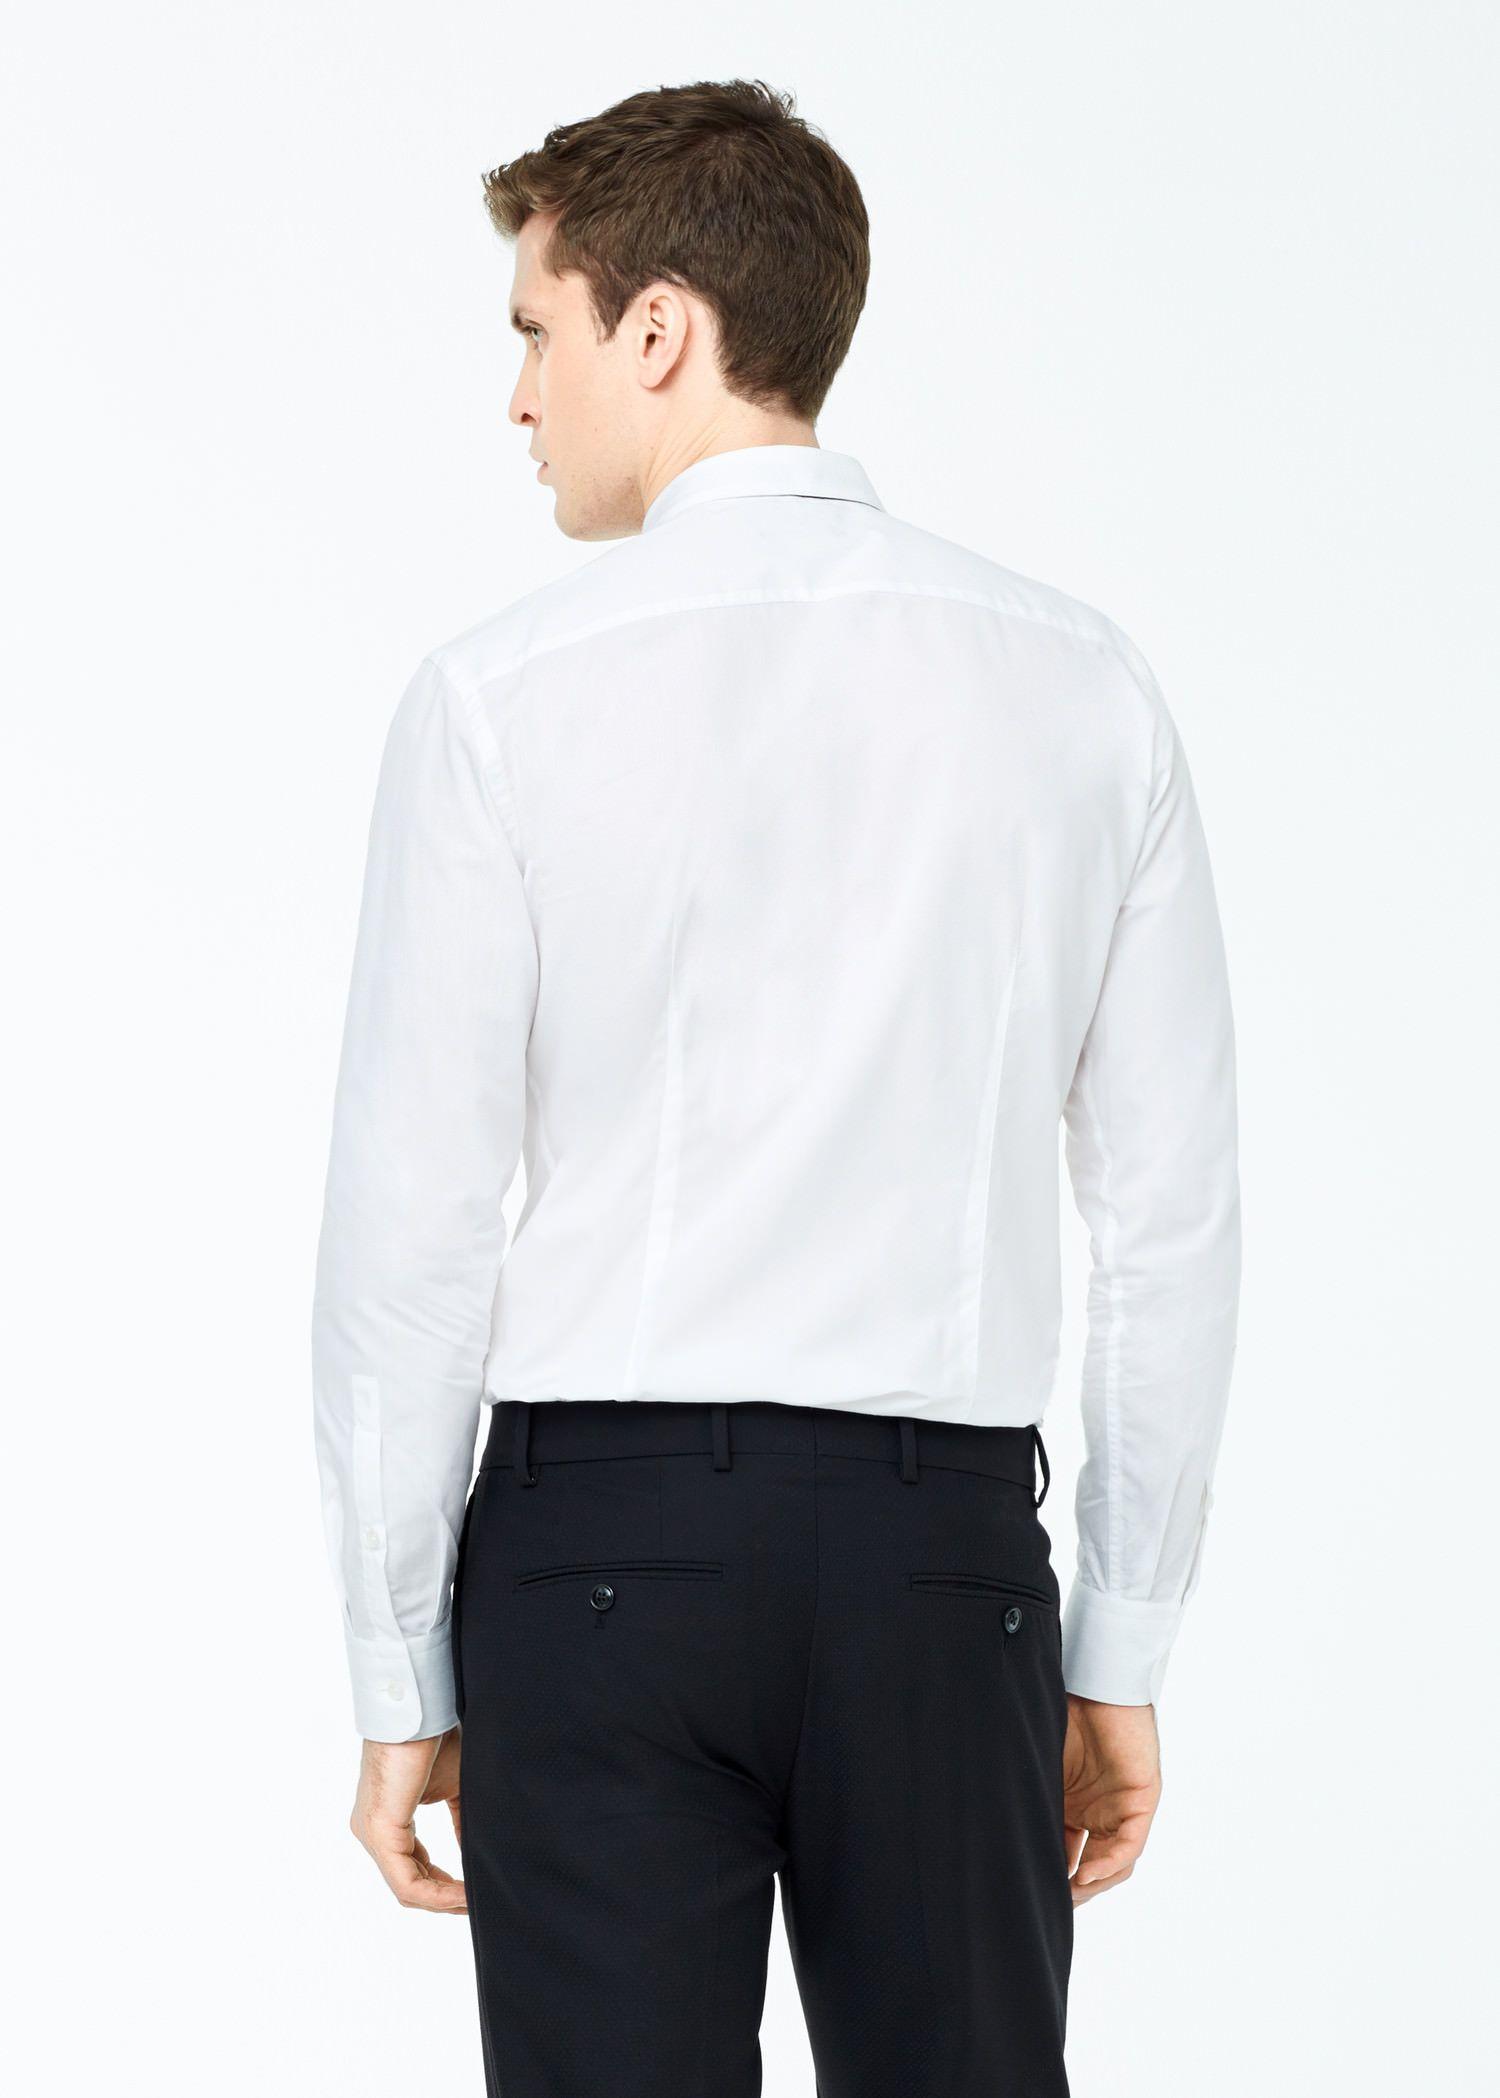 Mango Slim-fit Tailored Mao Collar Shirt in White for Men